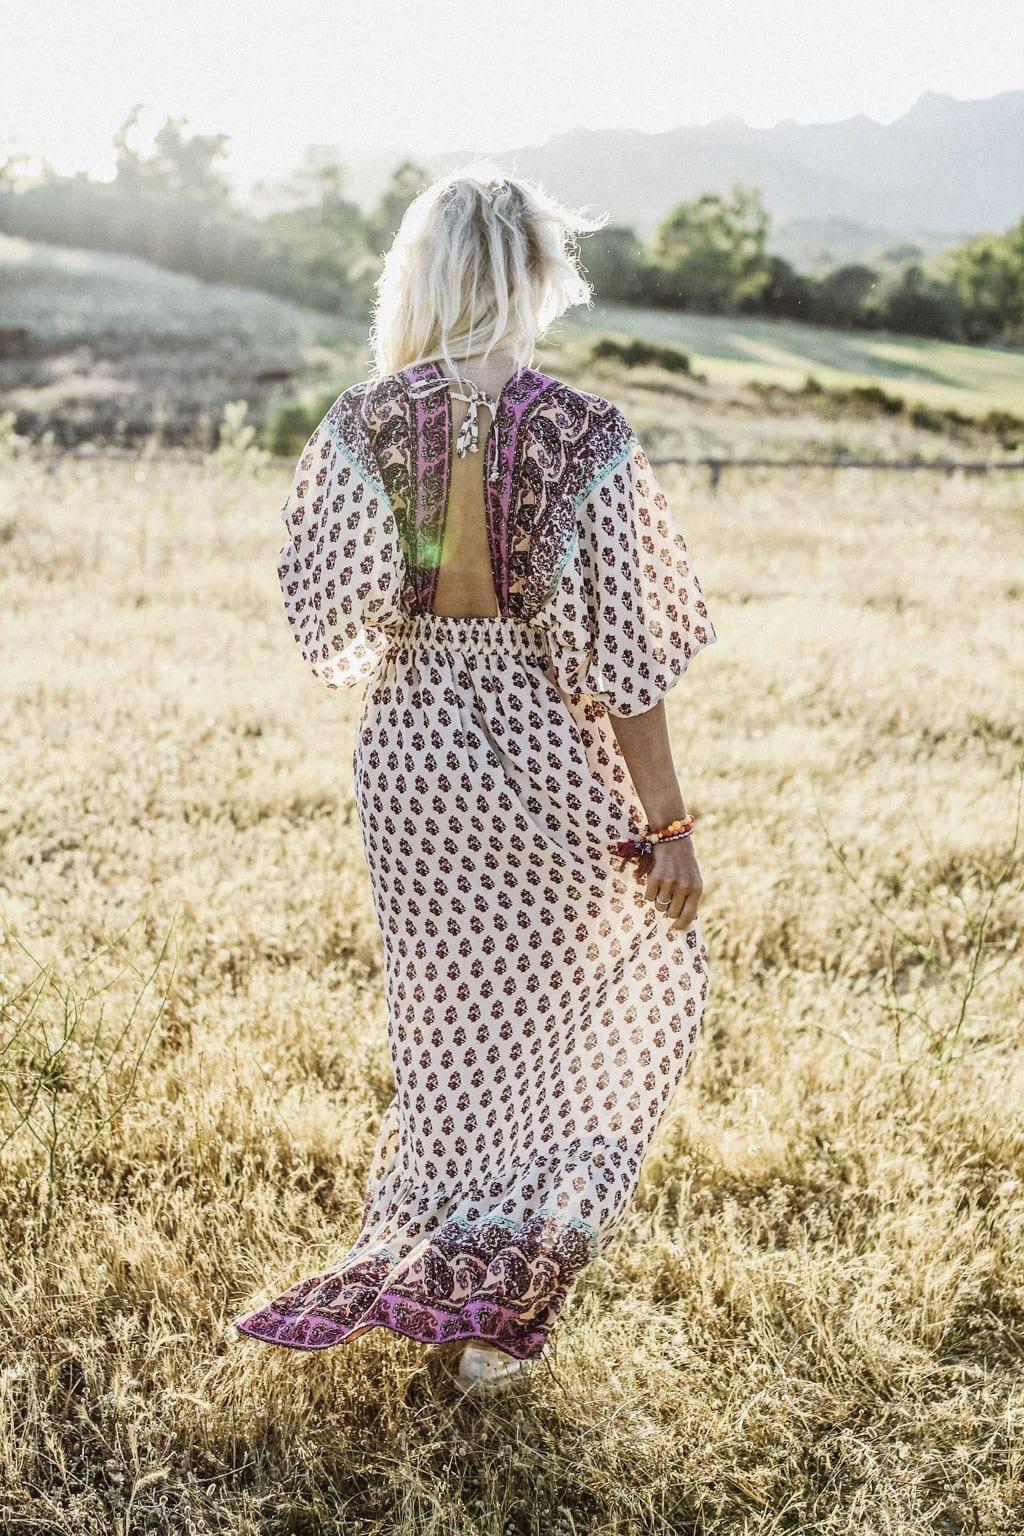 CK-1606_Sardinien-Sardegna-Sardinia-Italy-Italia-Fashion-Blog-Sun-Down-Dress-Blonde-Karin-Kaswurm-9844